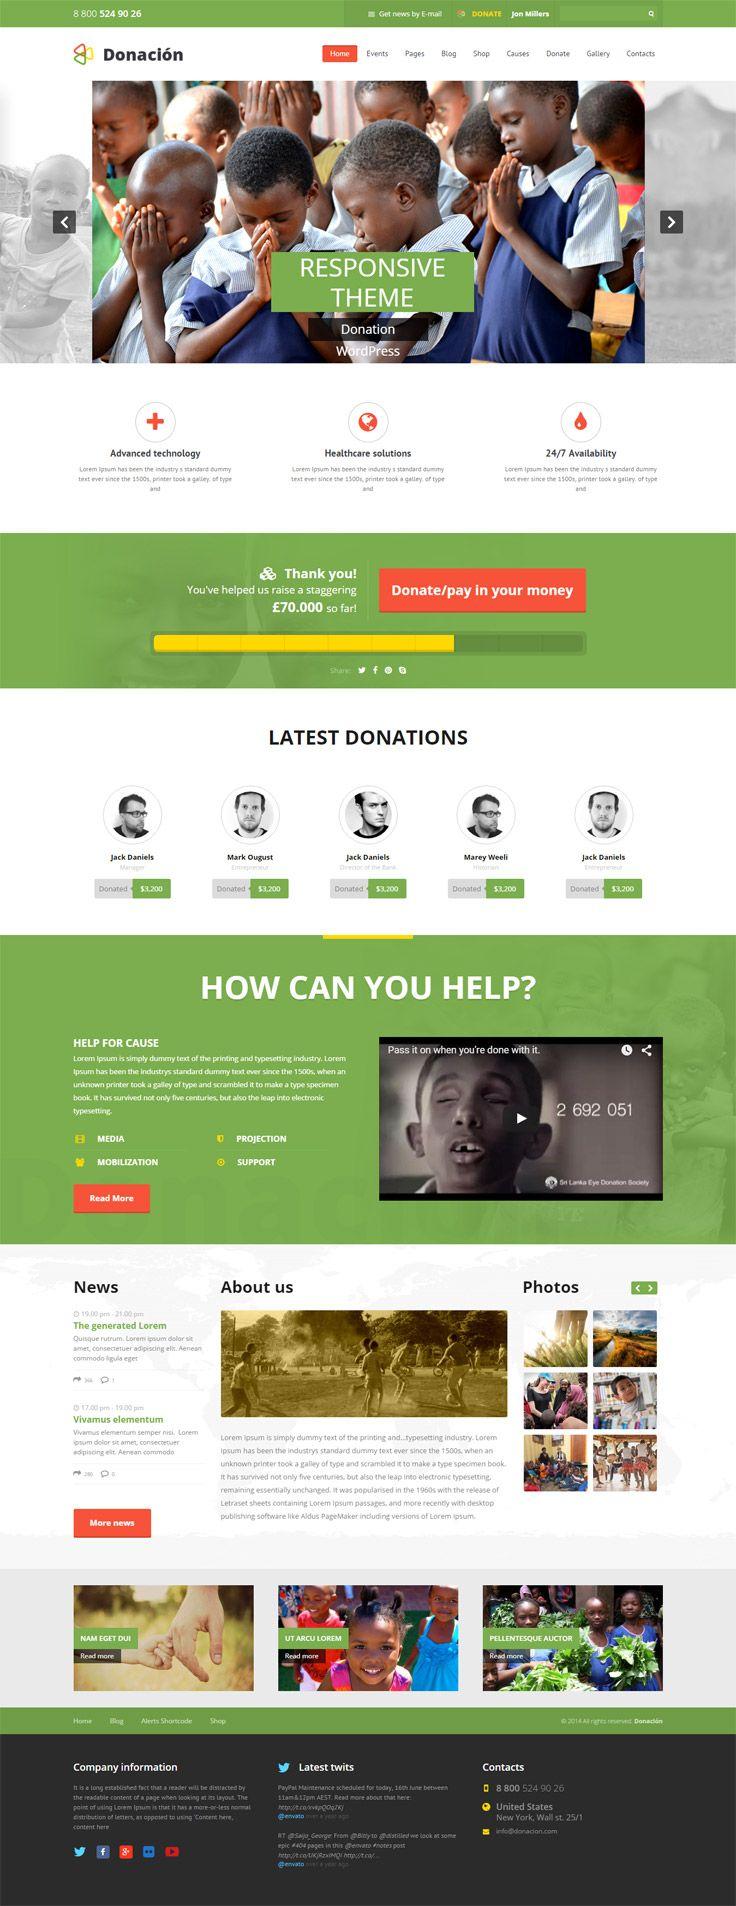 15 Best Wordpress Themes For Non Profit Organizations Wordpress Theme Responsive Nonprofit Website Design Wordpress Website Design